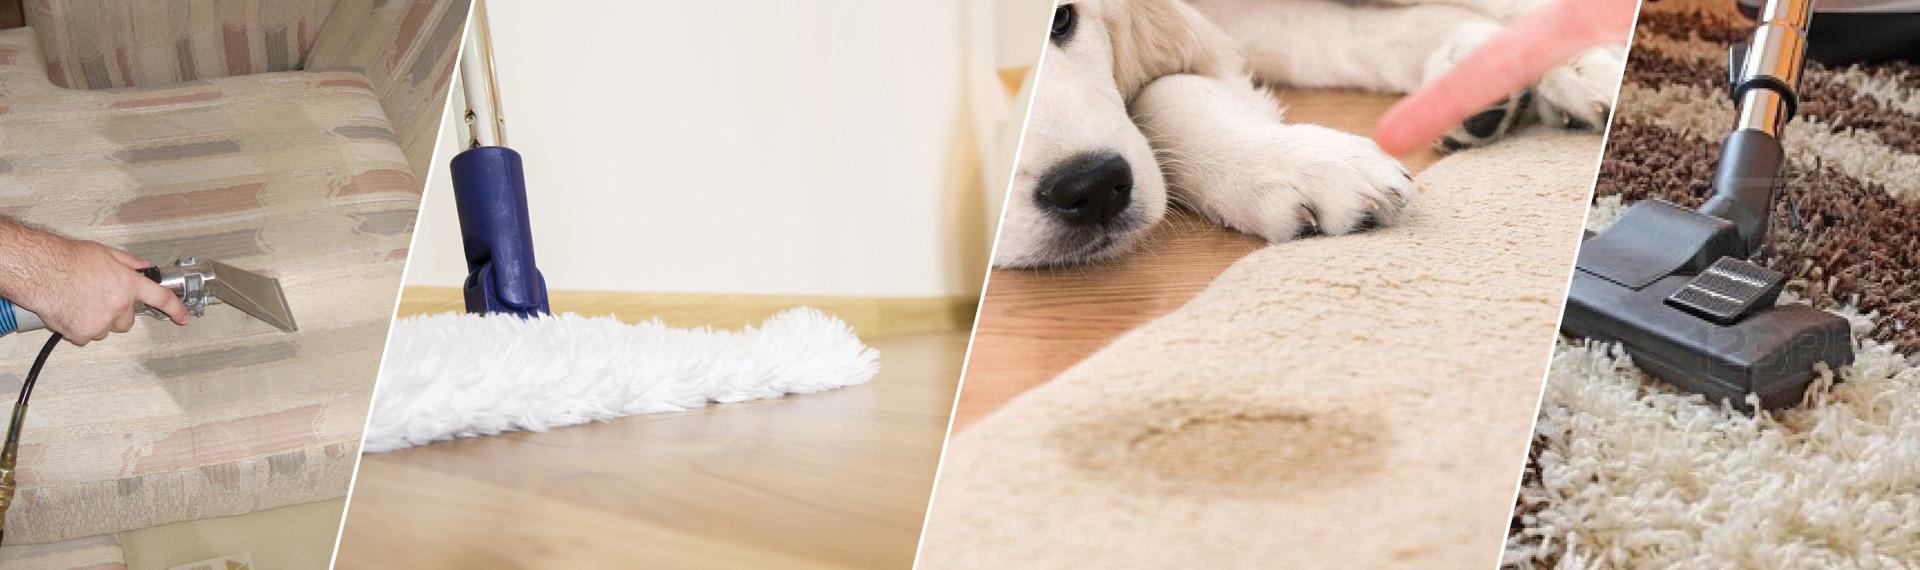 Reliable Carpet Cleaning Westlake Village CA